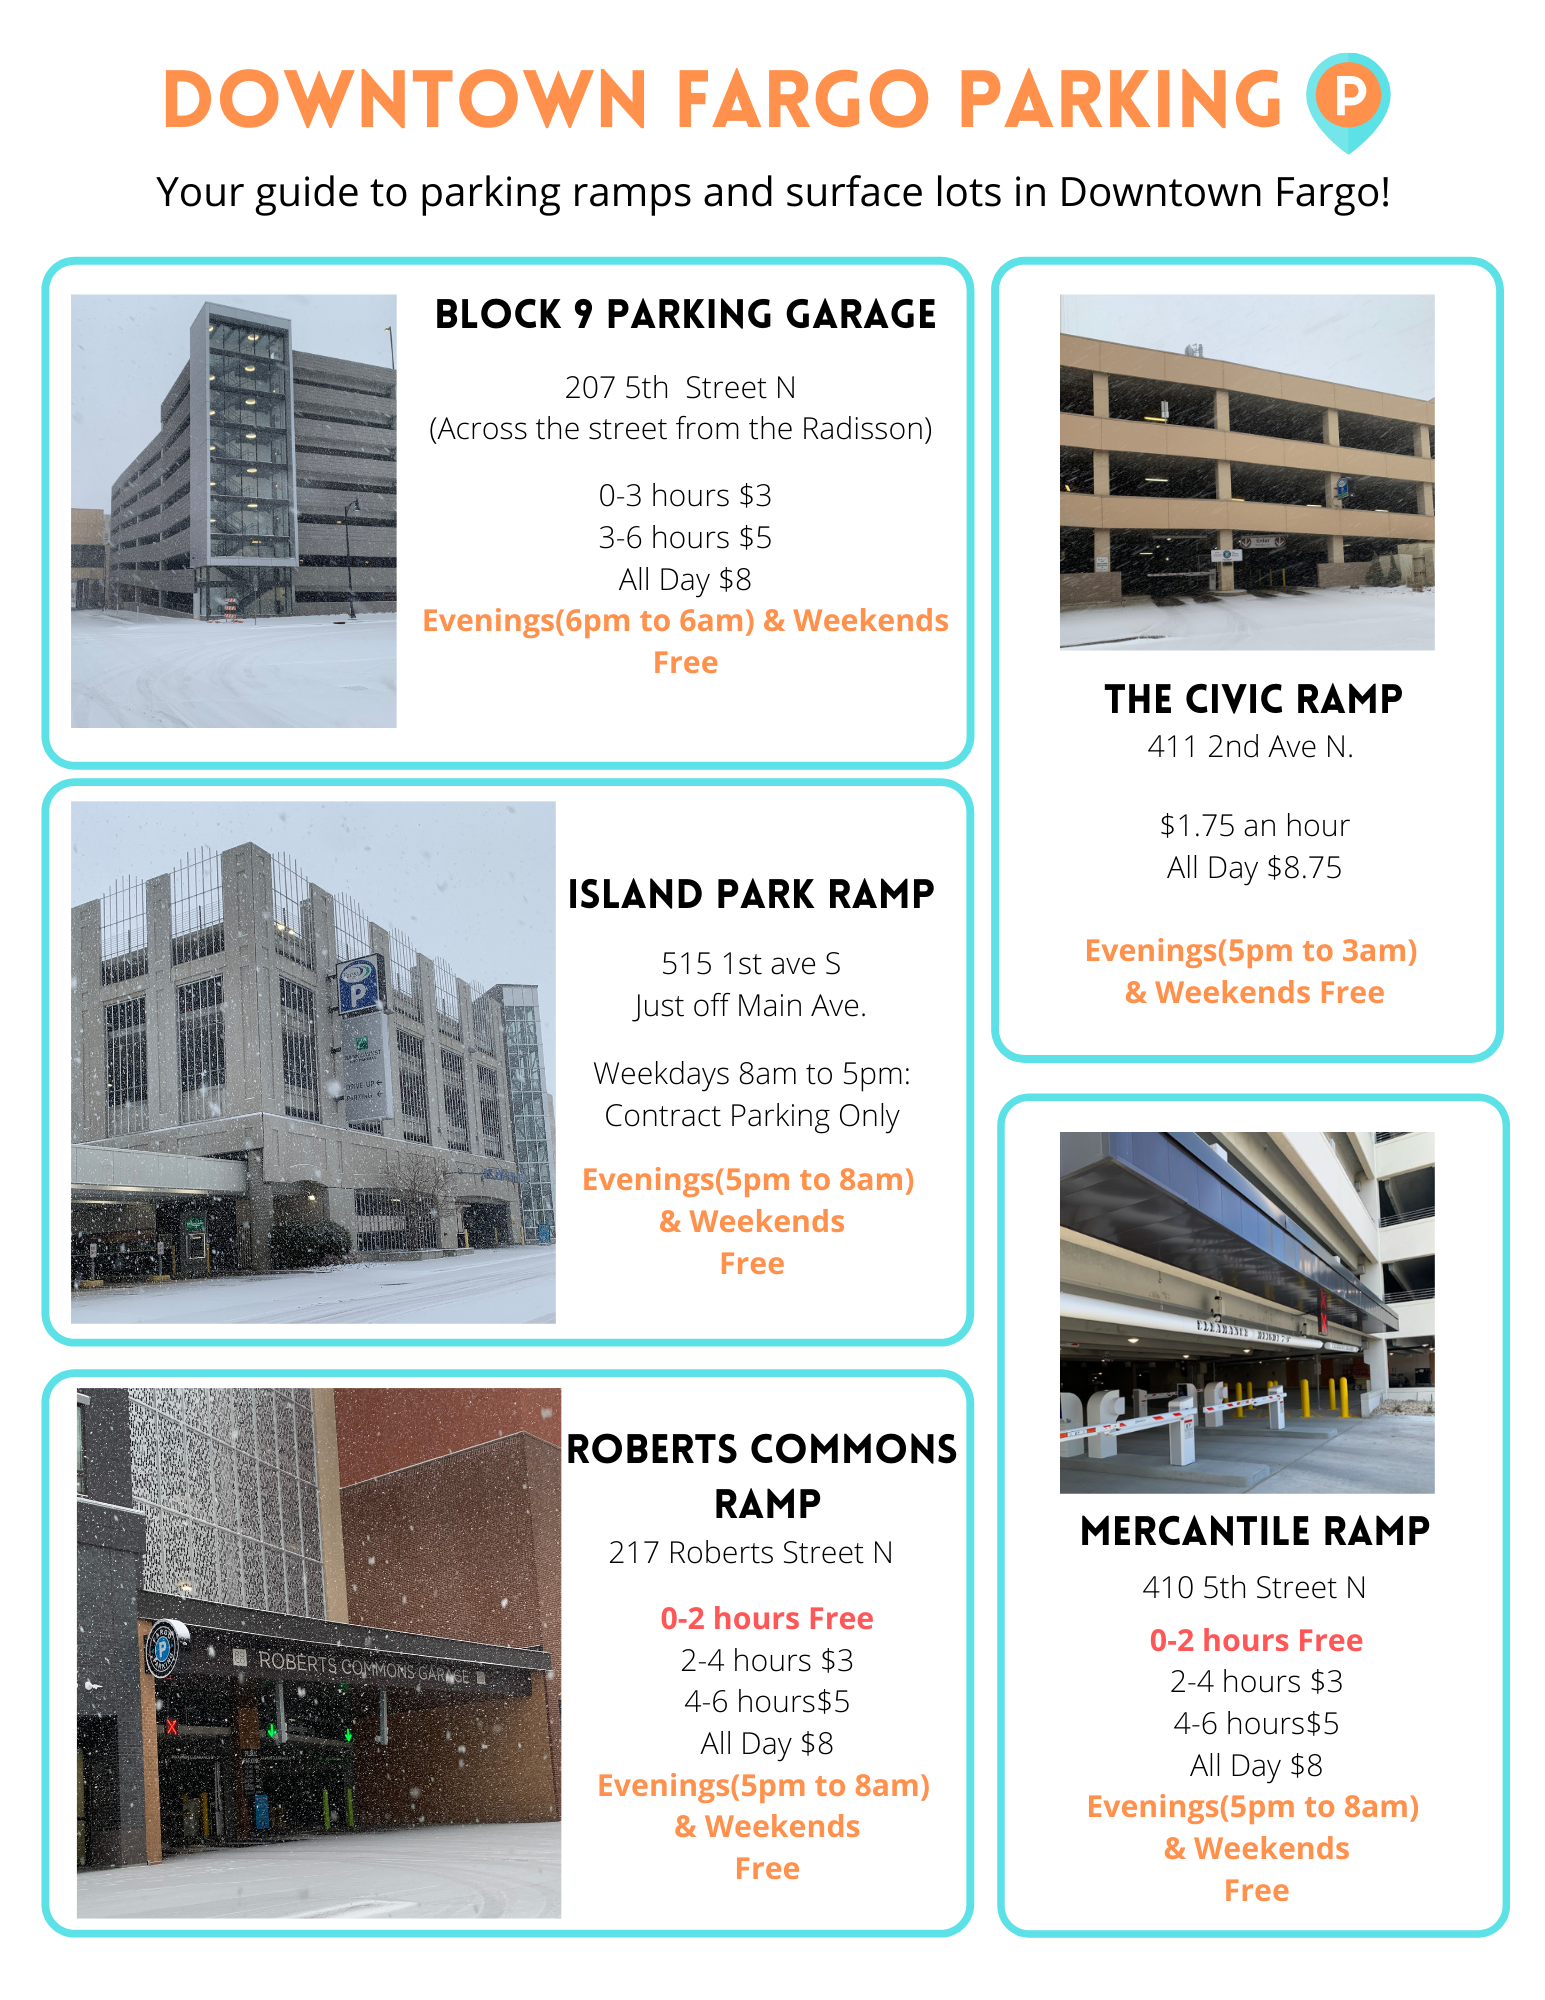 Downtown Fargo Parking Guide (2)